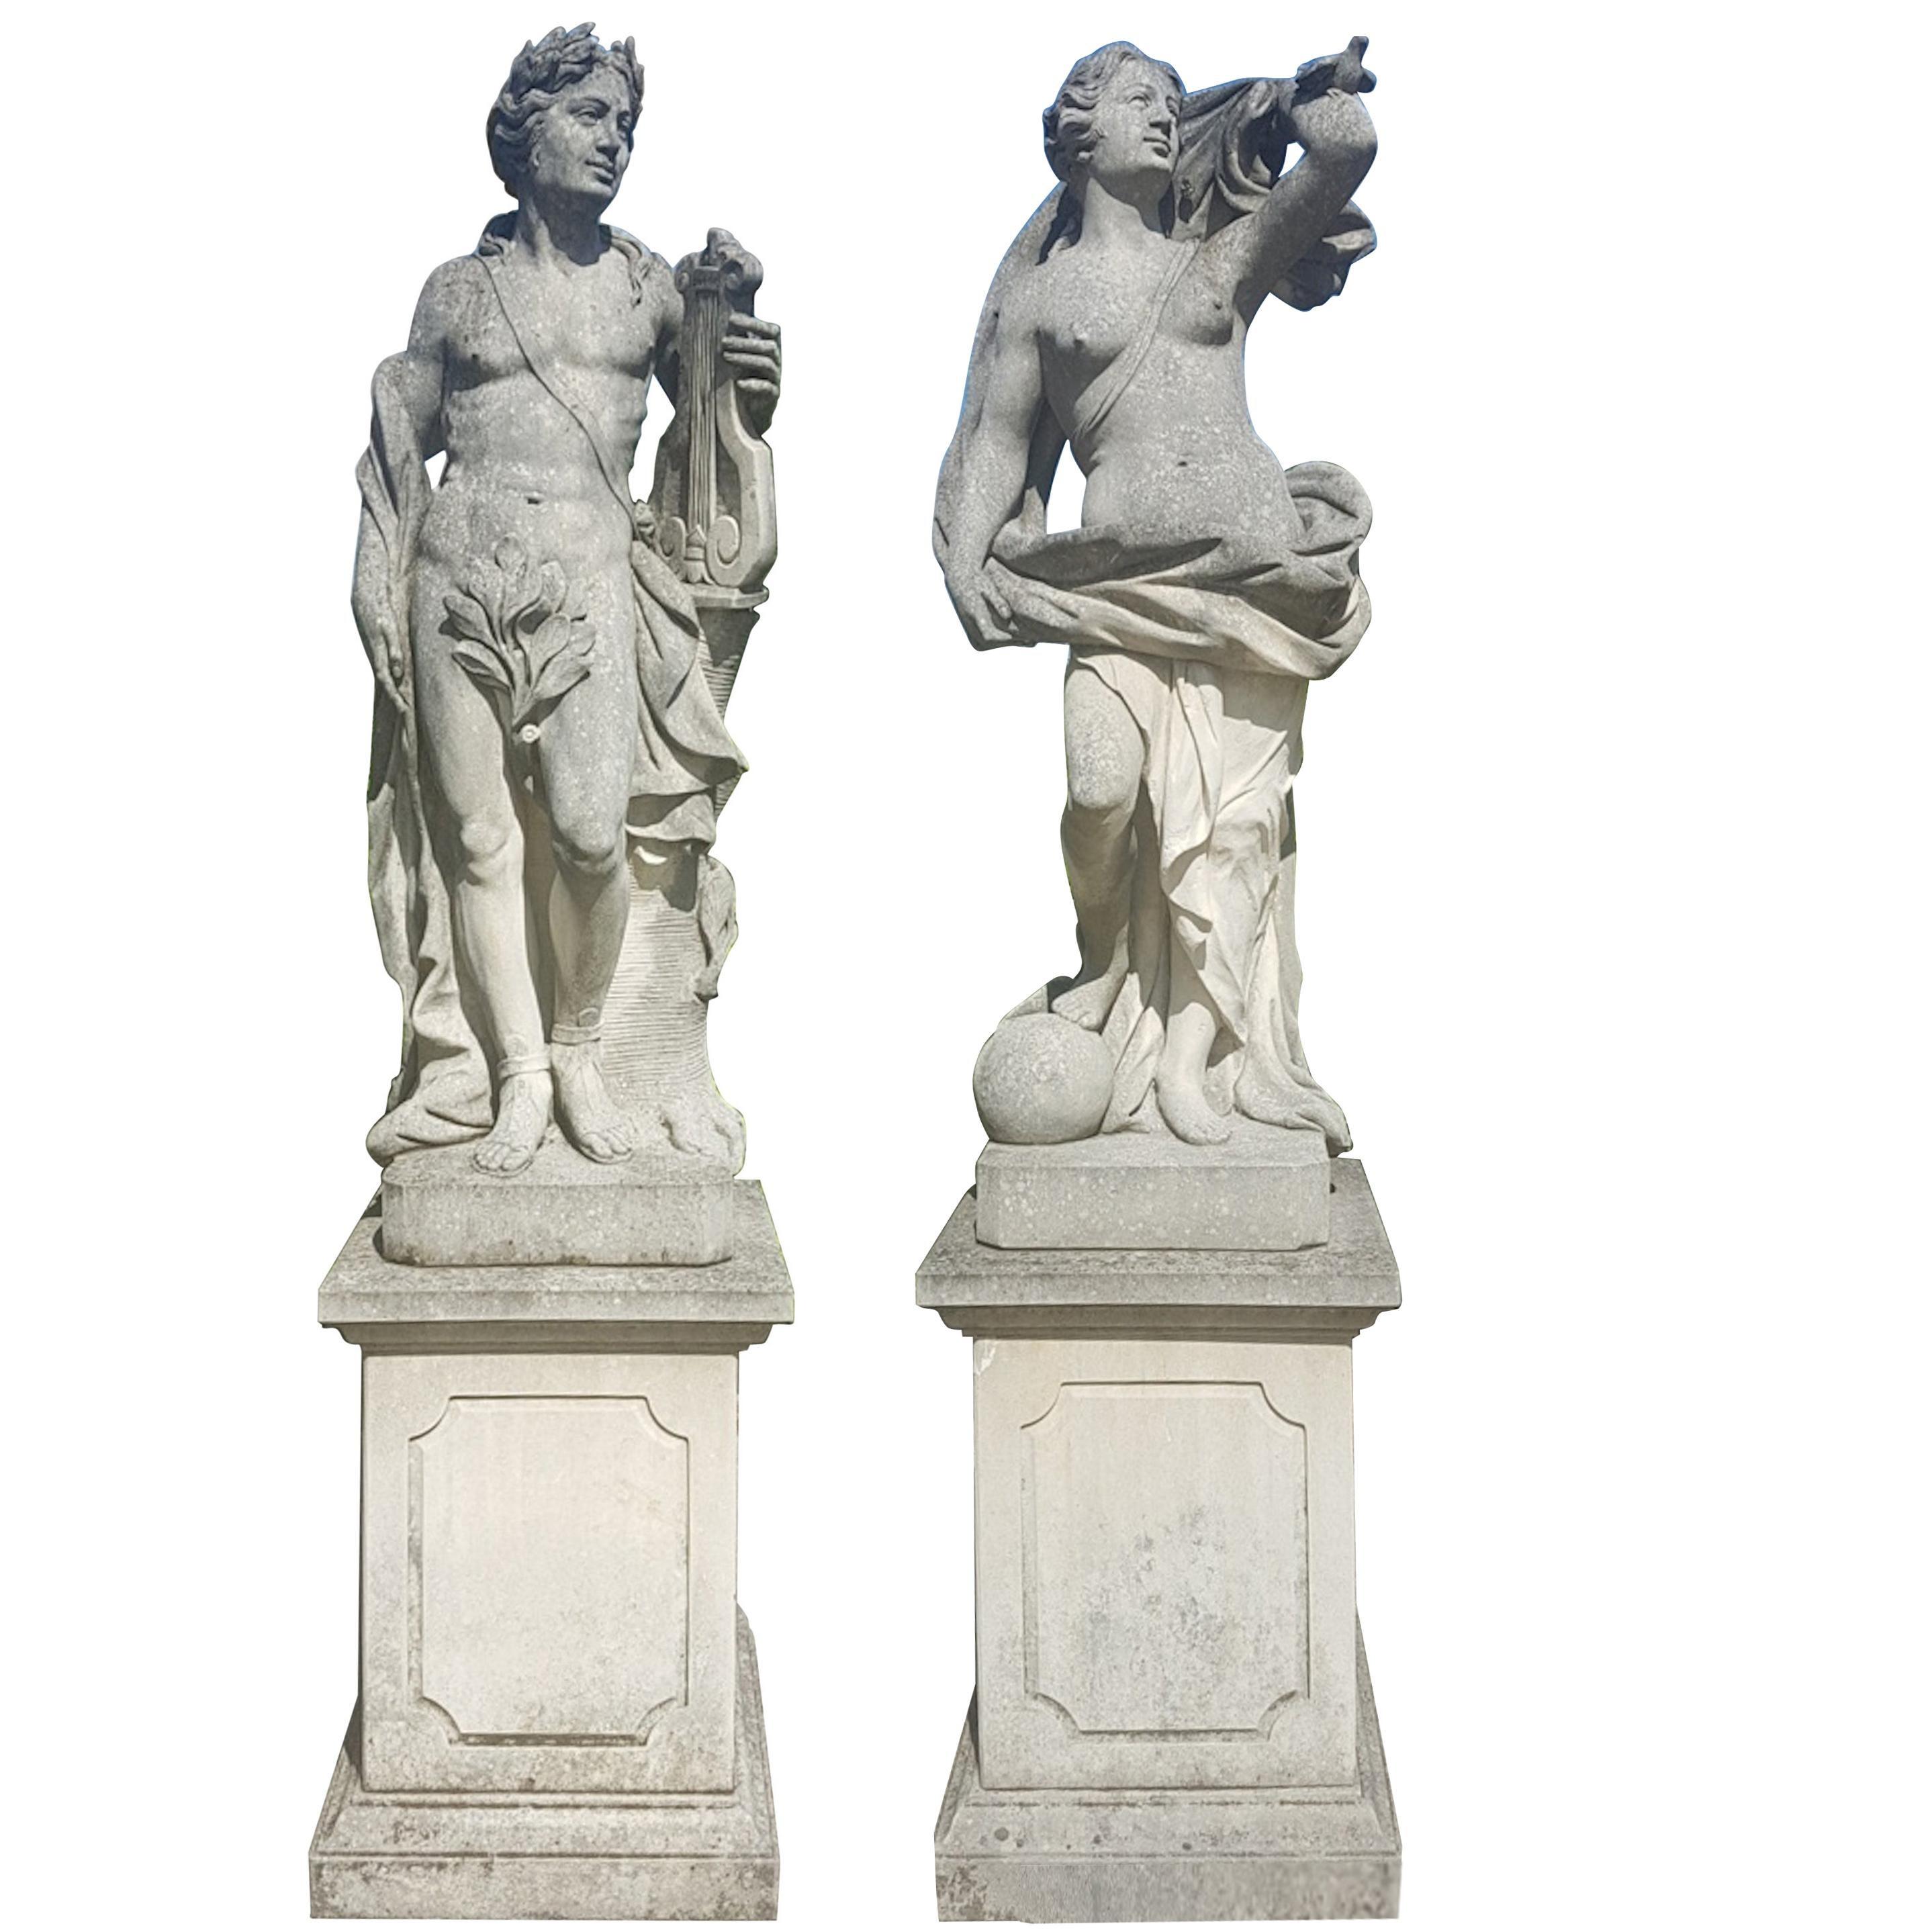 Two Italian Stone Garden Sculptures of Apollo and Roman Goddess